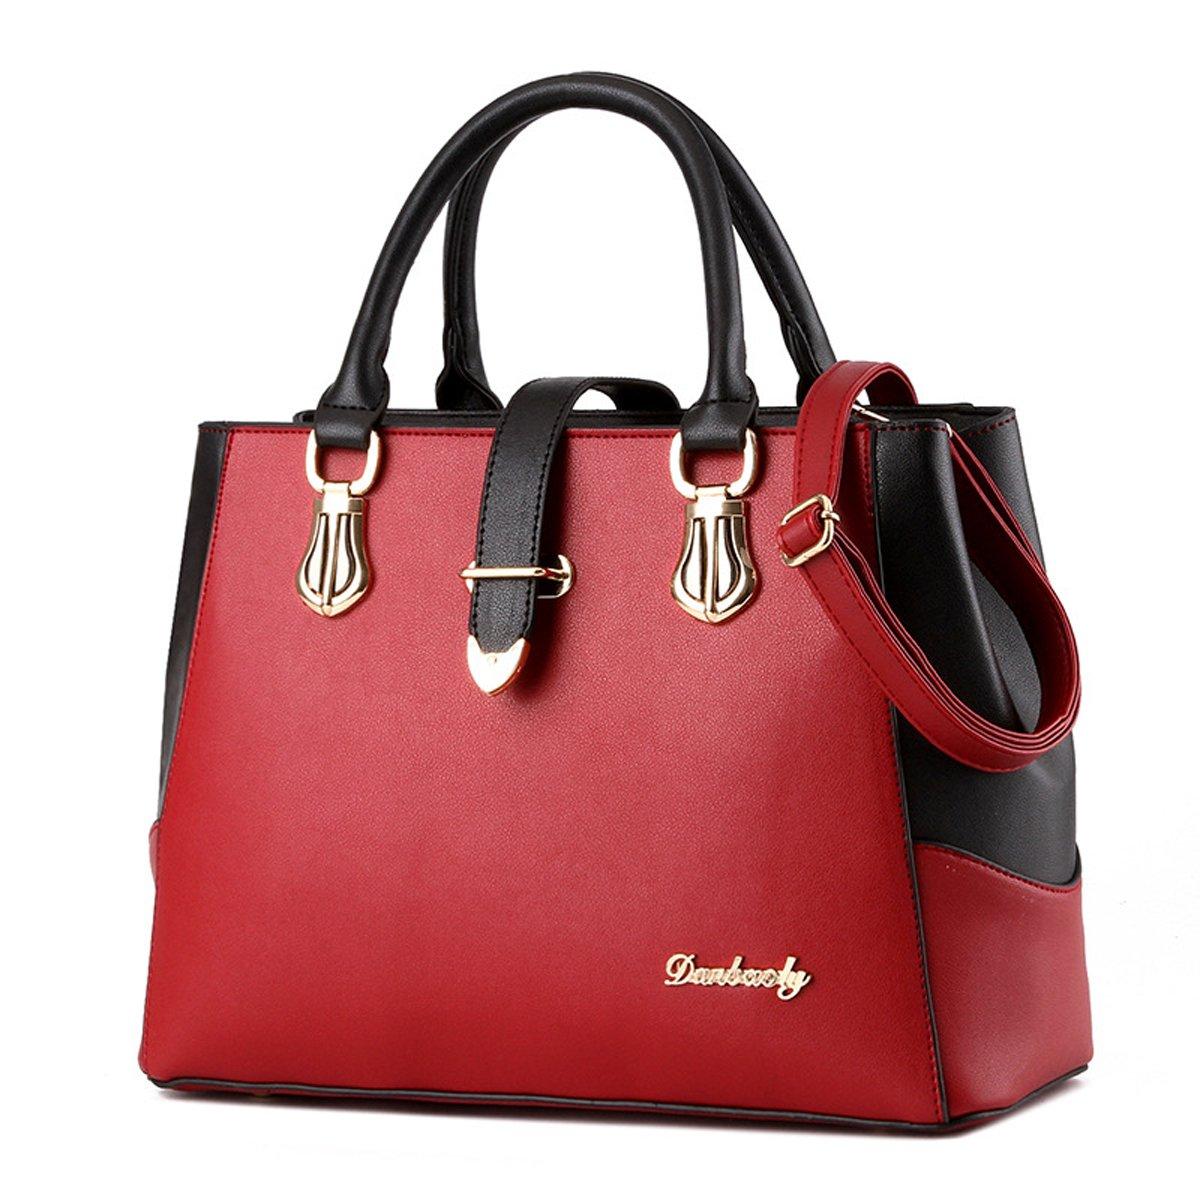 Nevenka Top Handle Handbag for Women Pu Leather Purses and Handbags for Girl Summer Crossbady Satchel (Red)